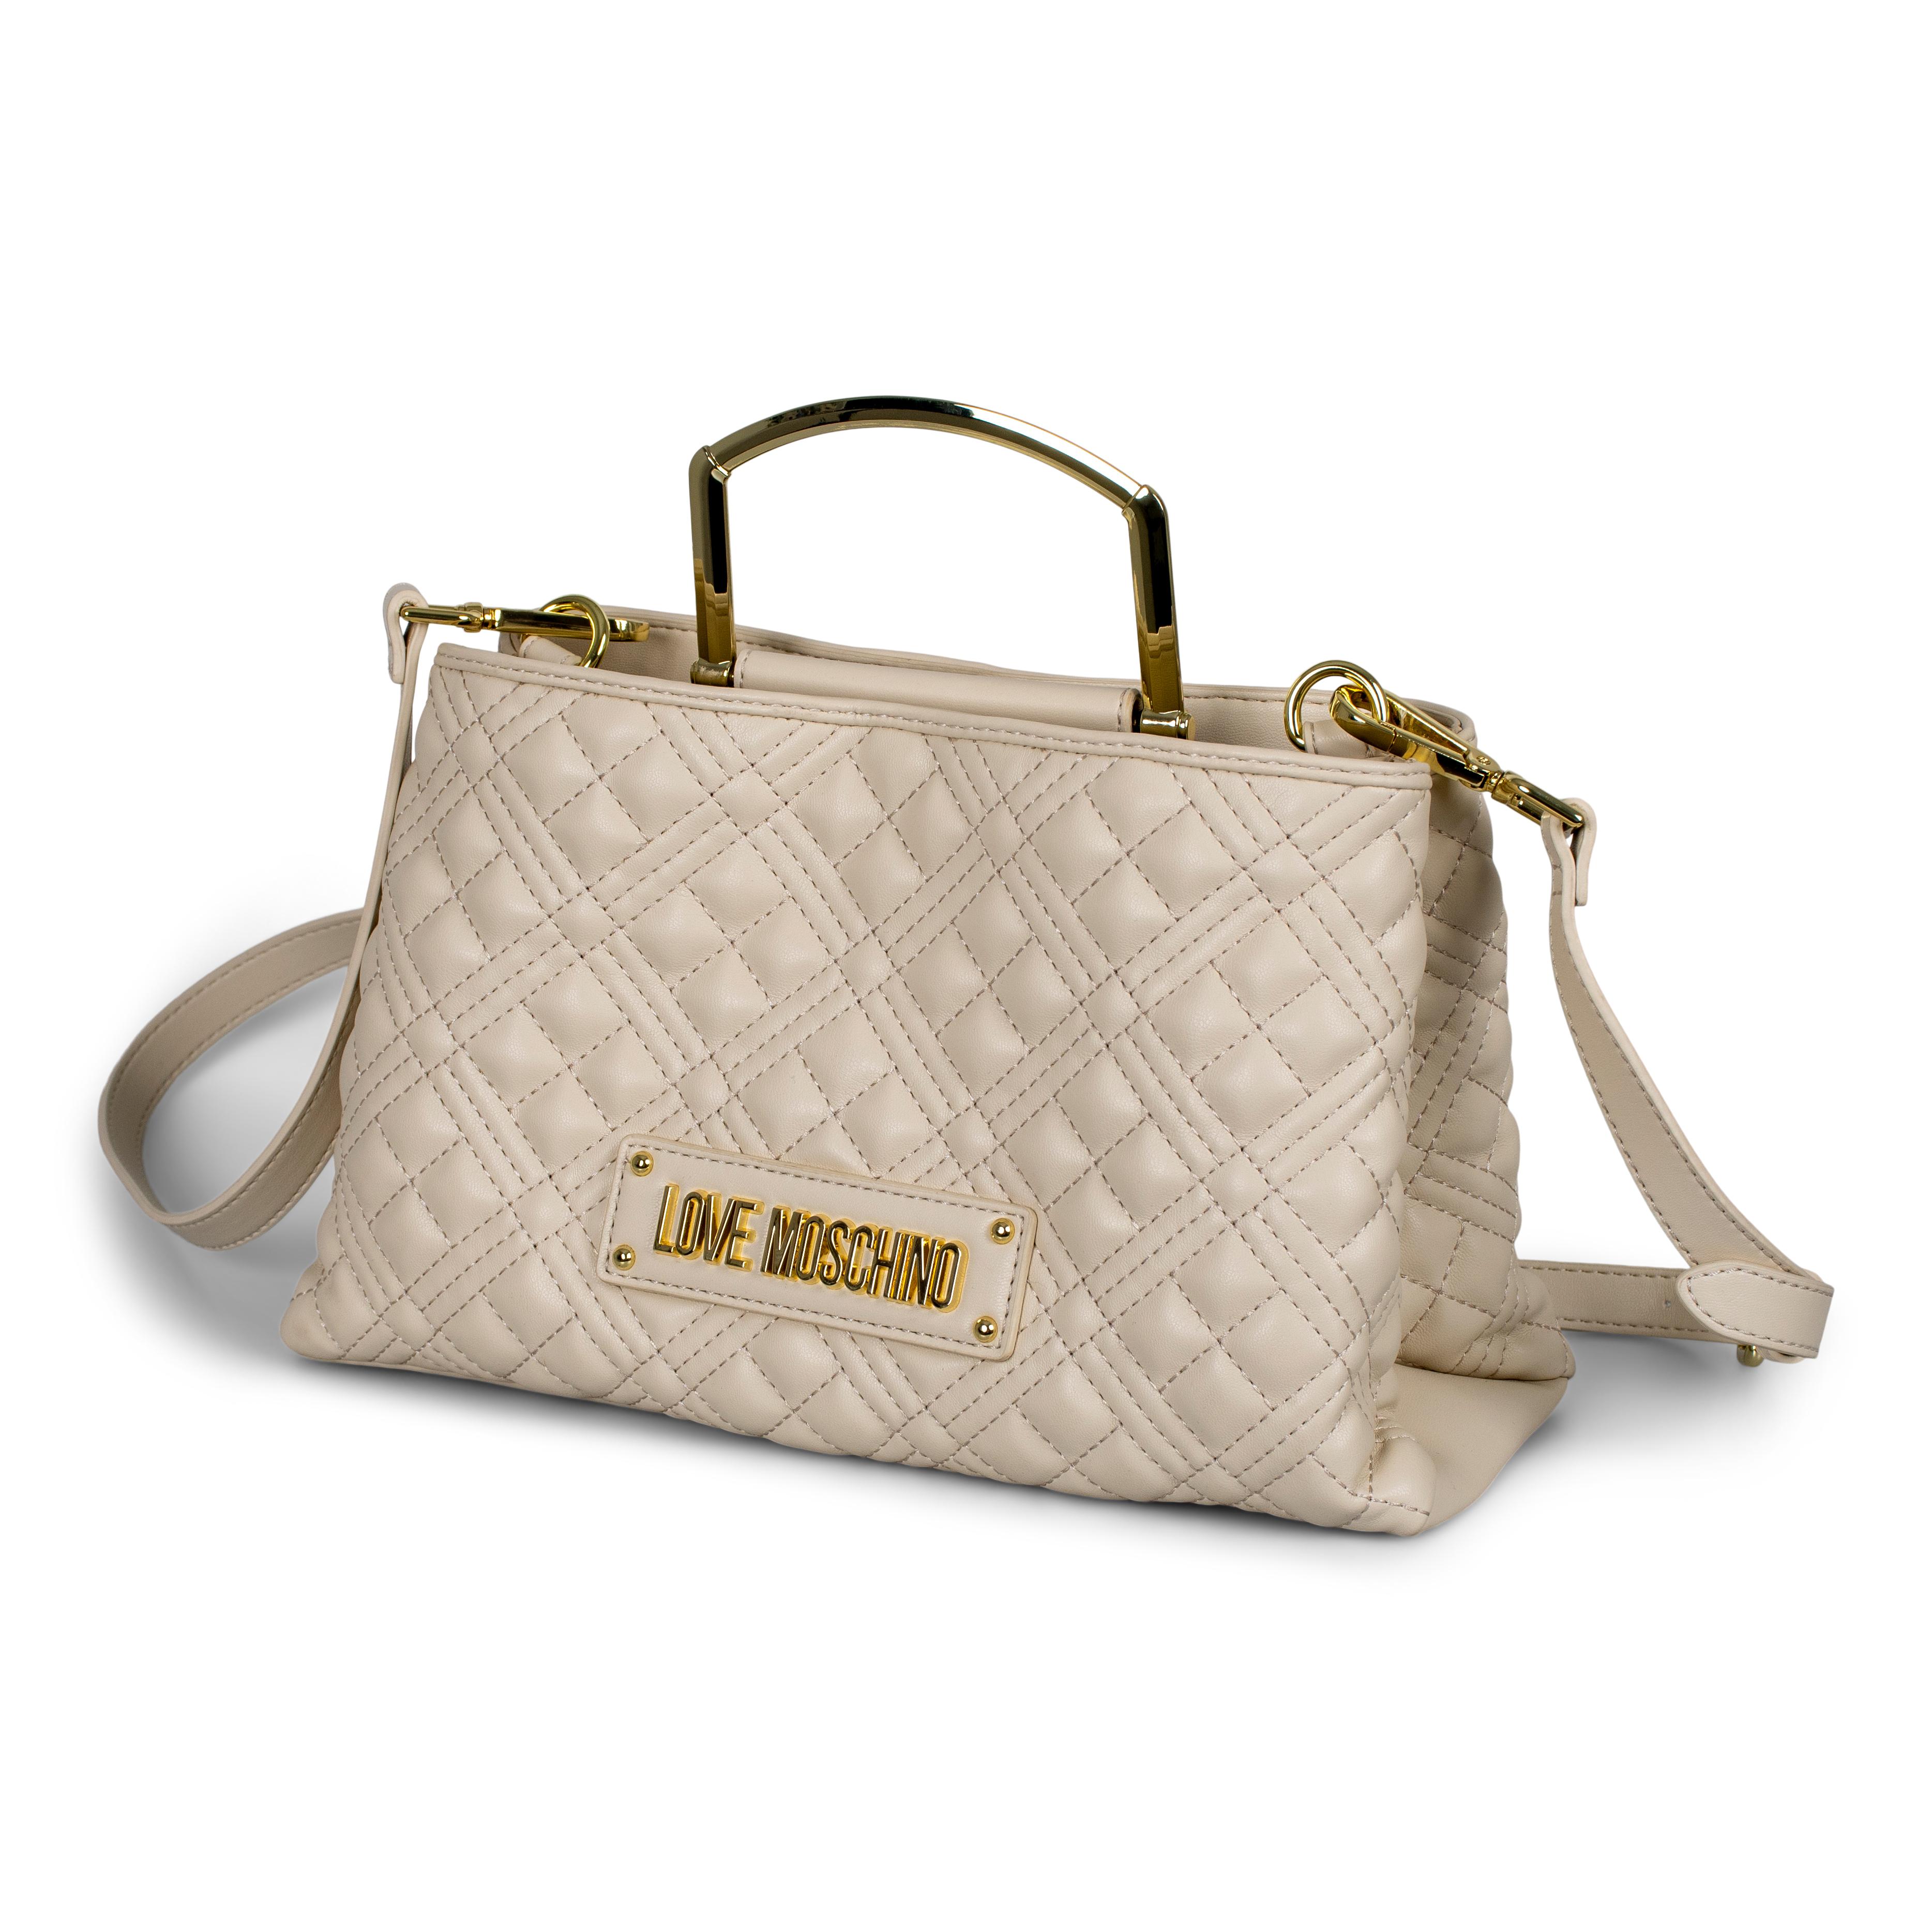 Love Moschino Quiltet Tote håndtaske, avorio